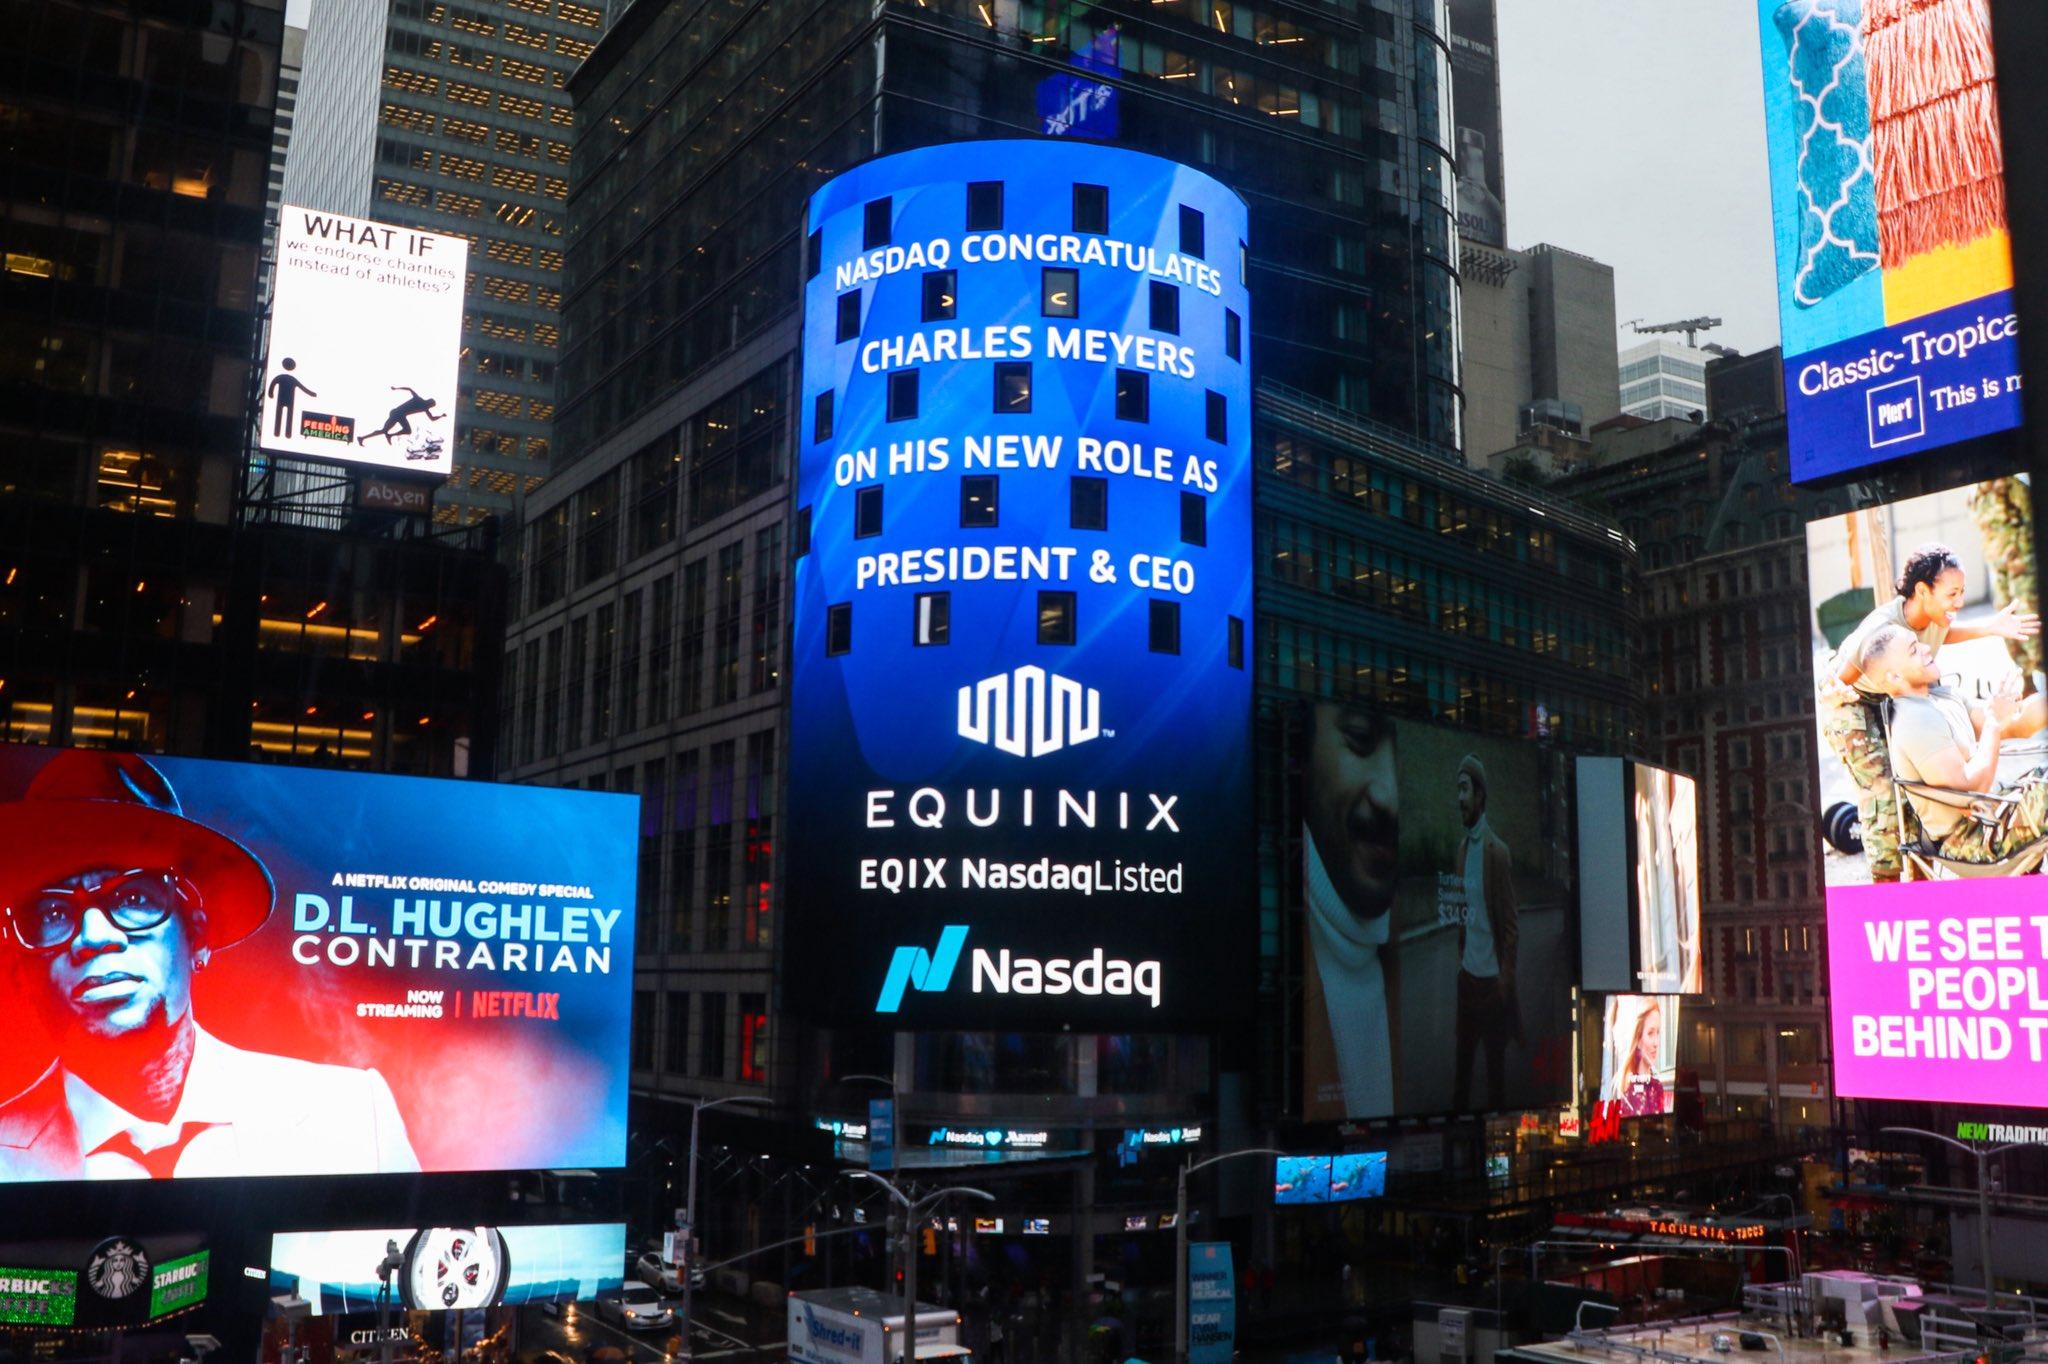 Equinix at Times Square